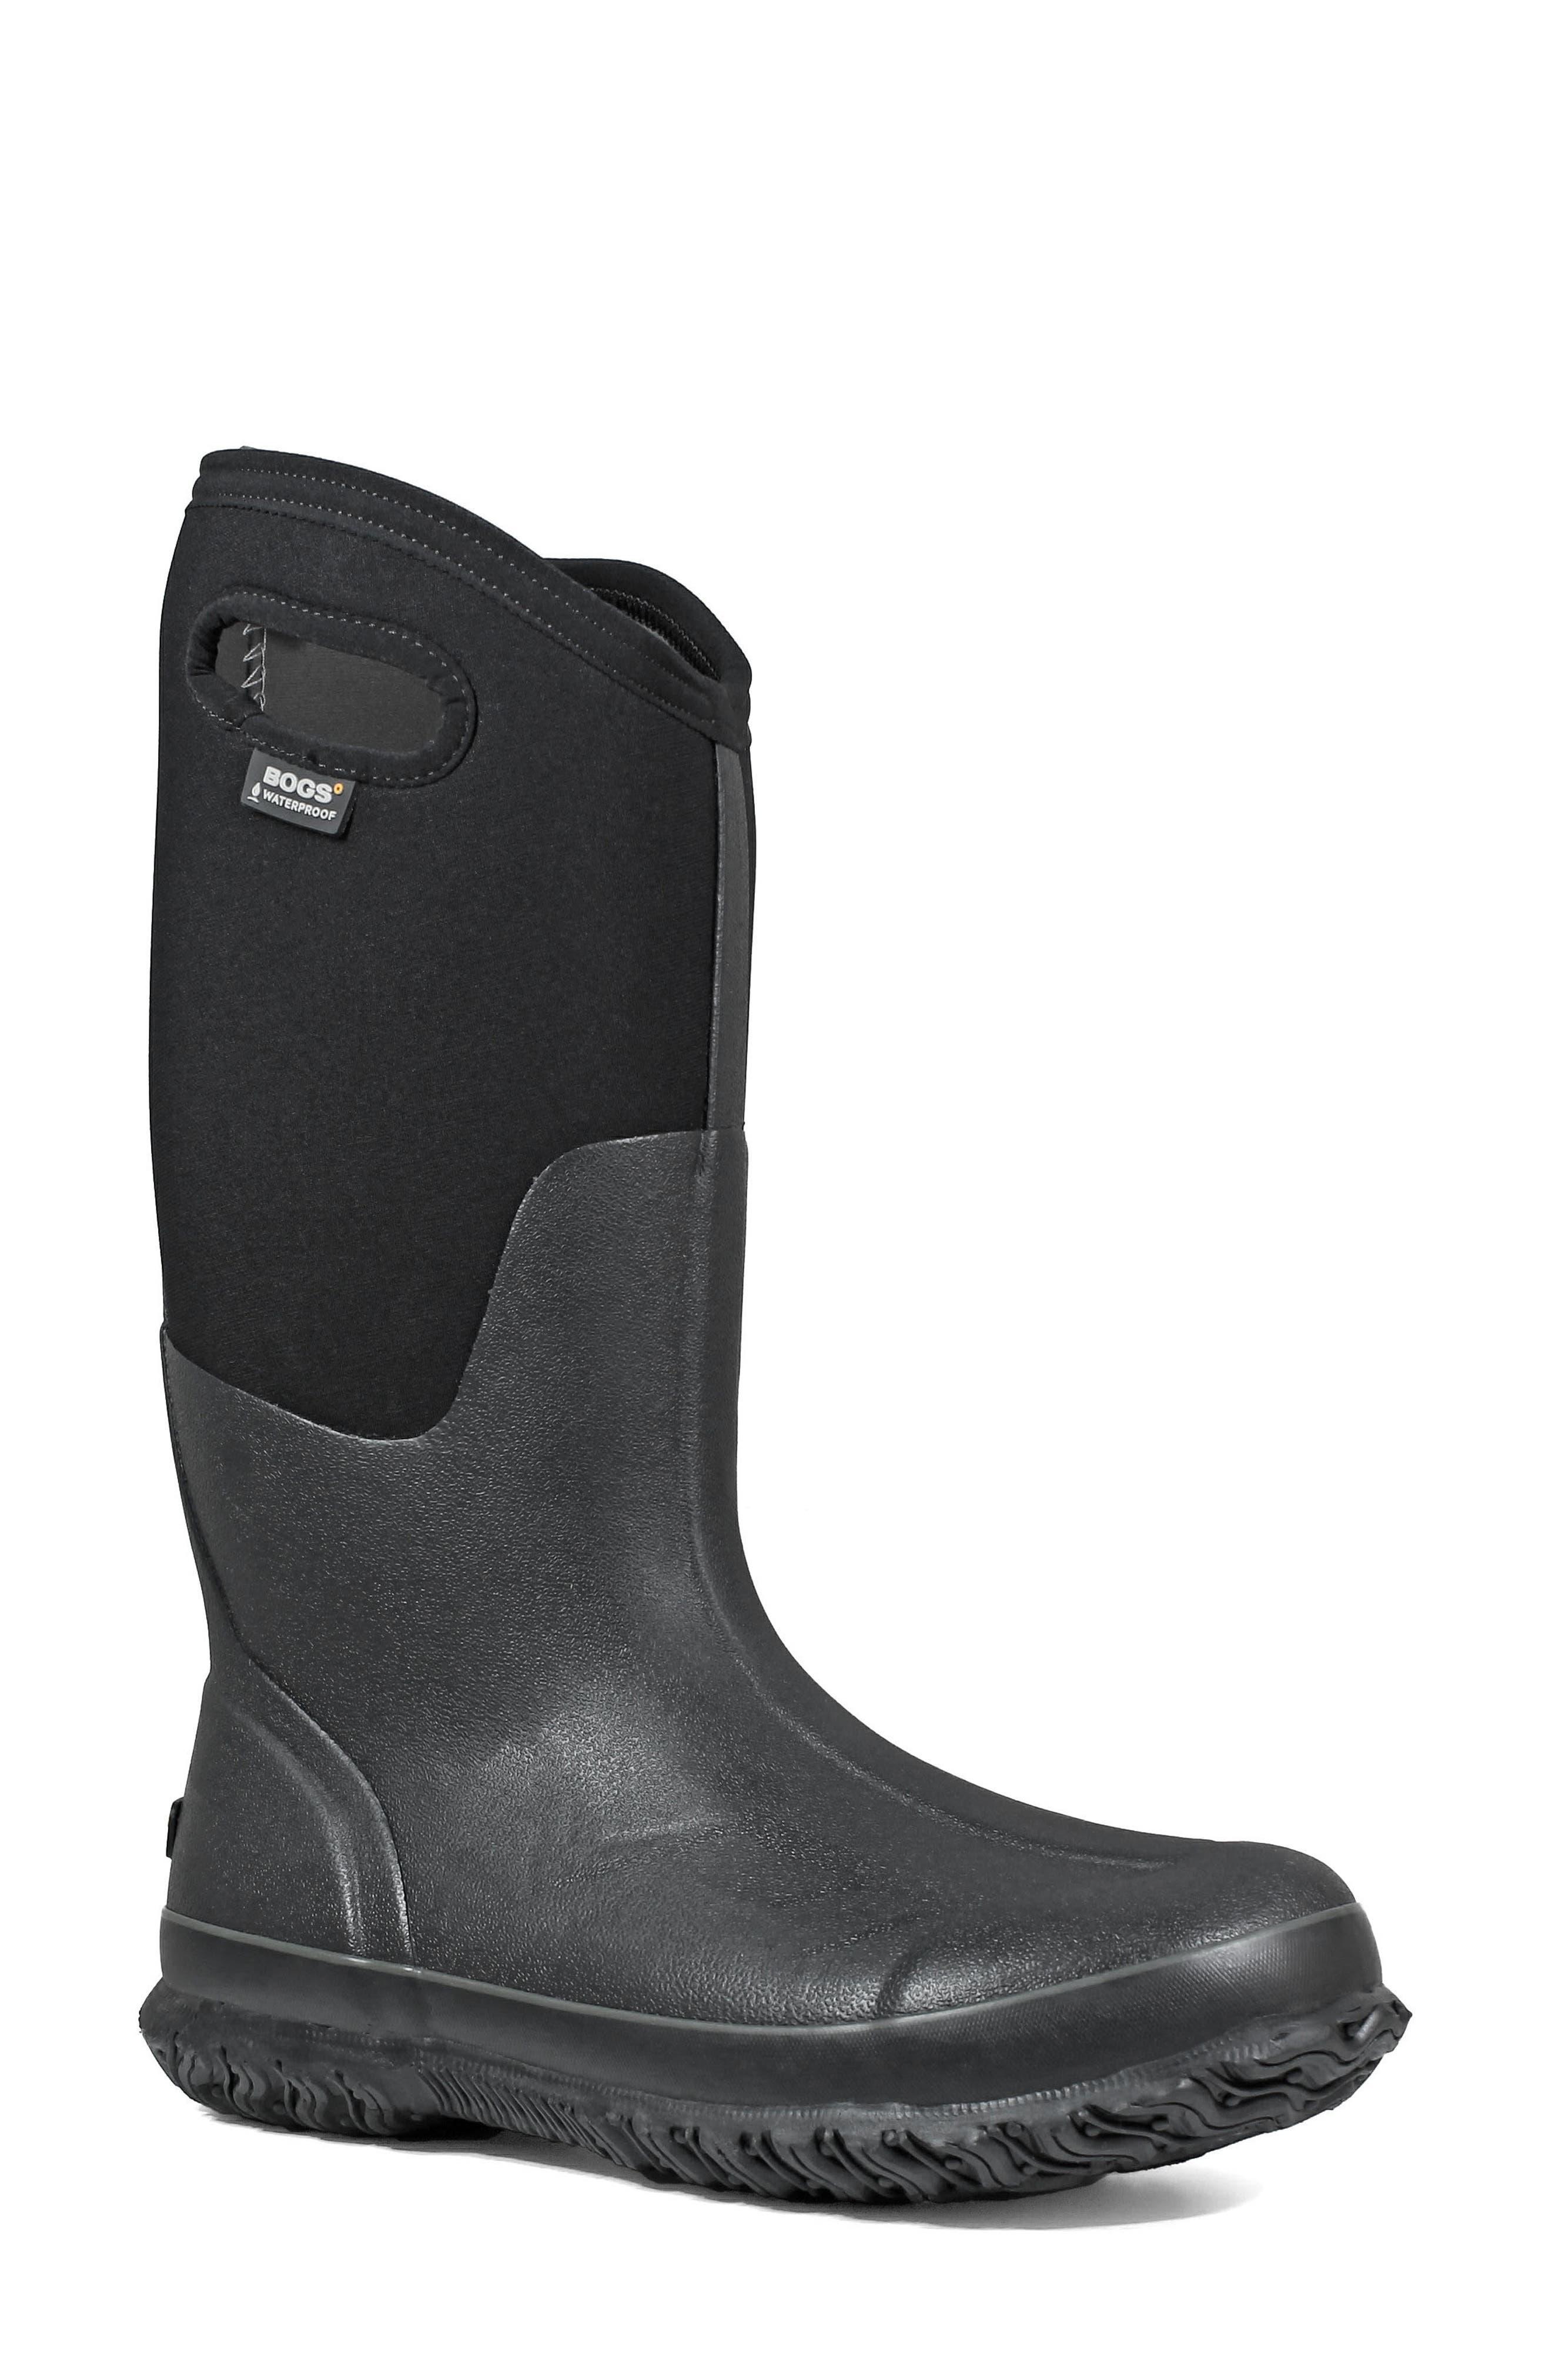 BOGS, Classic Tall Waterproof Snow Boot, Main thumbnail 1, color, BLACK